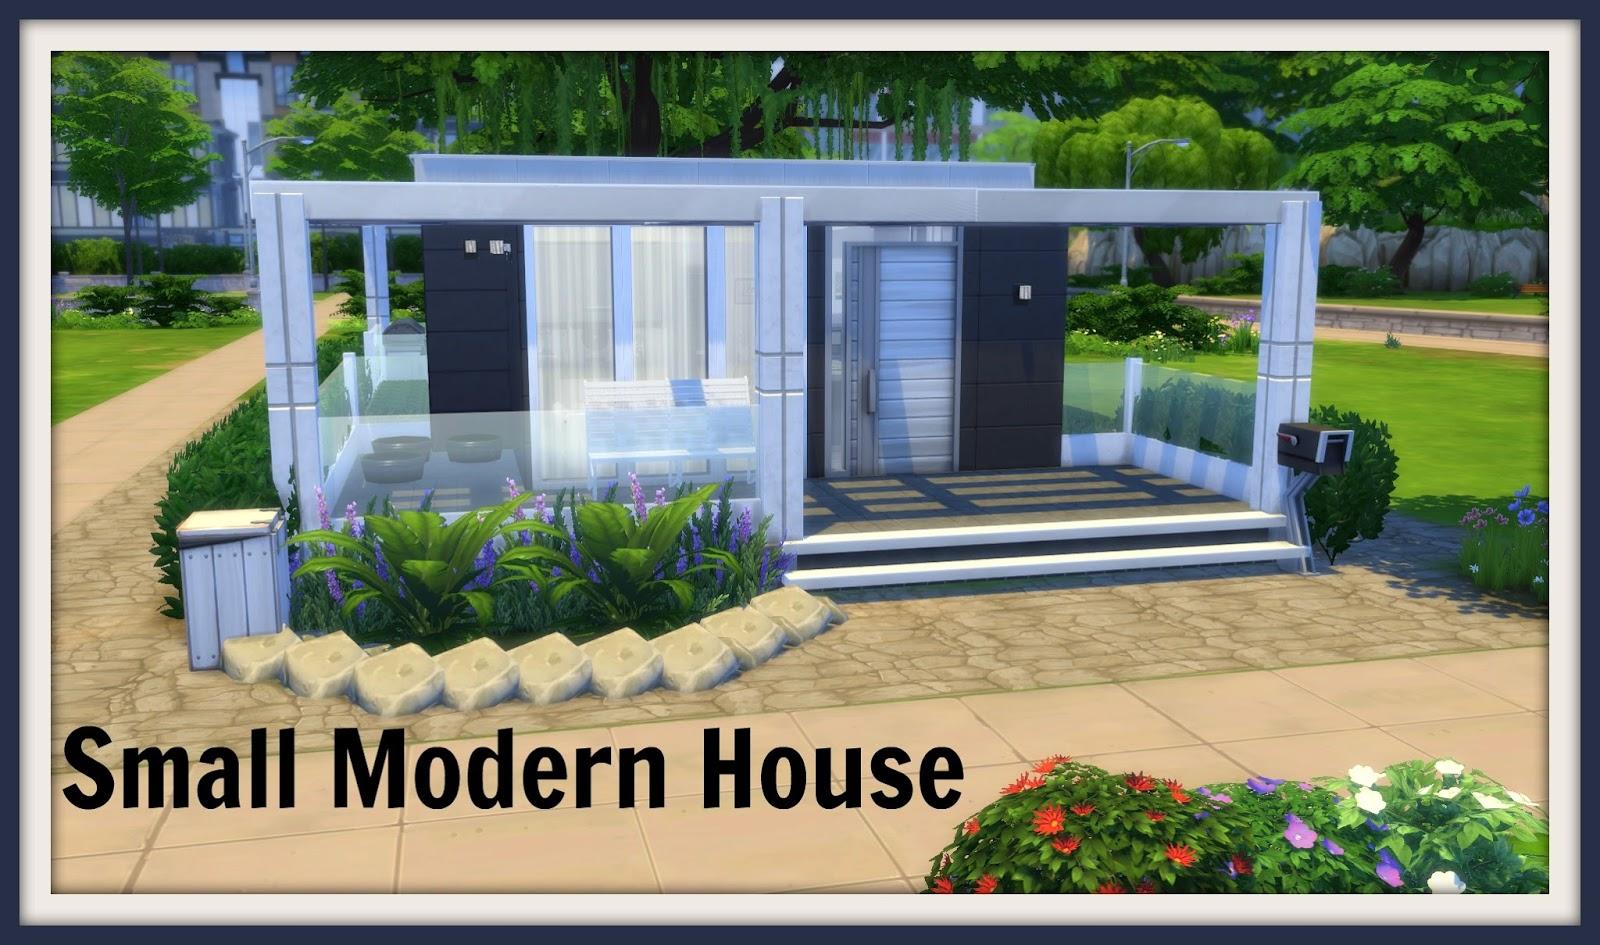 Sims 4 - Small Modern House - Dinha